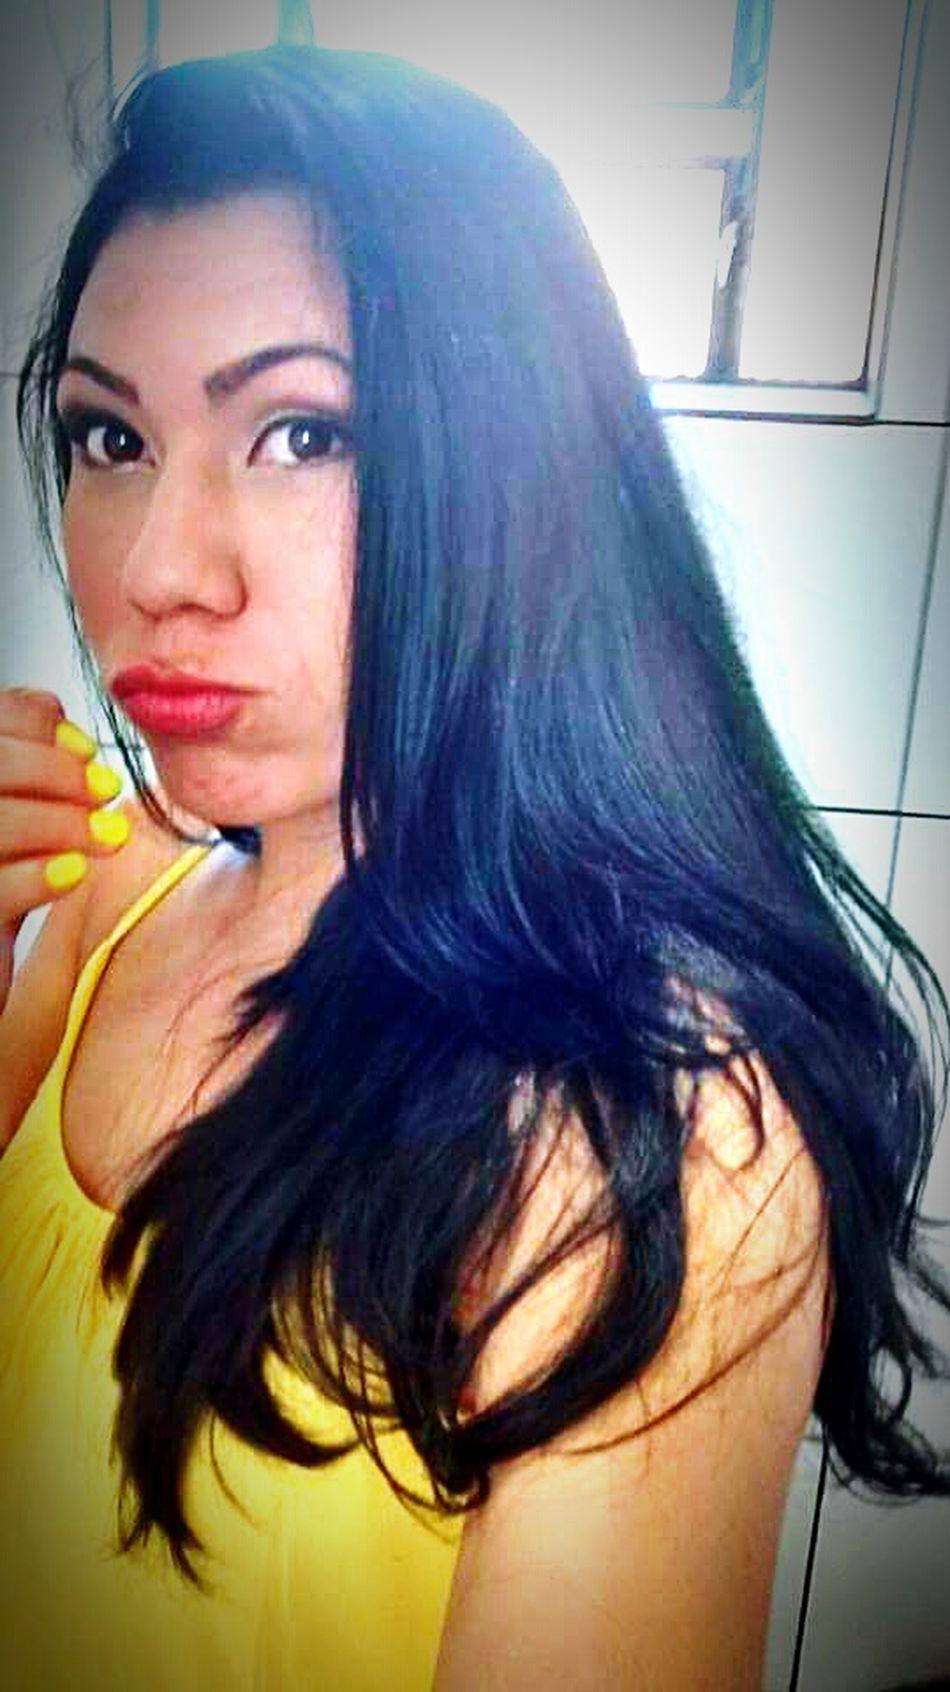 First Eyeem Photo Love ♥ Yellow Morena ❤ Ai Que Tudo!!!! Aniversário!  Dia Das Maes Family❤ Goodnight